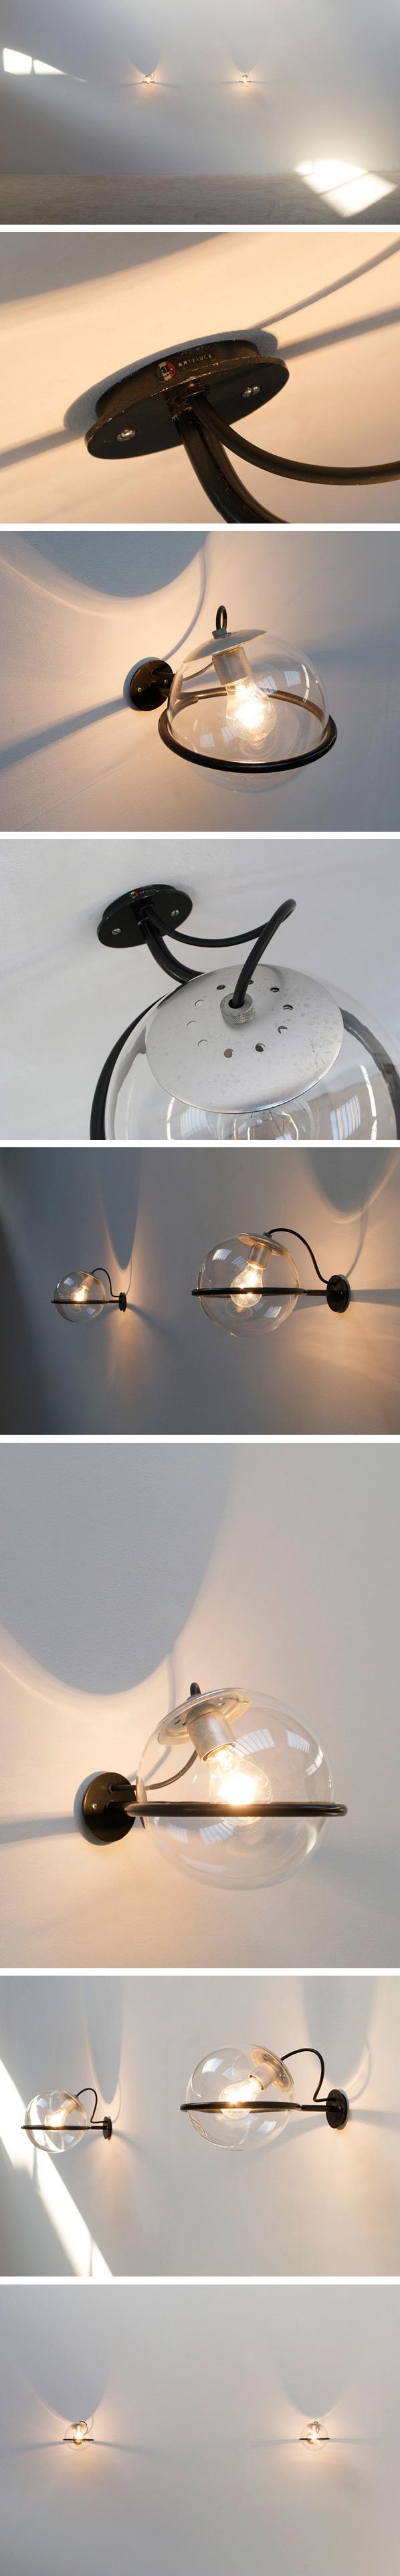 Gino Sarfatti Arteluce pair of wall lamps Large